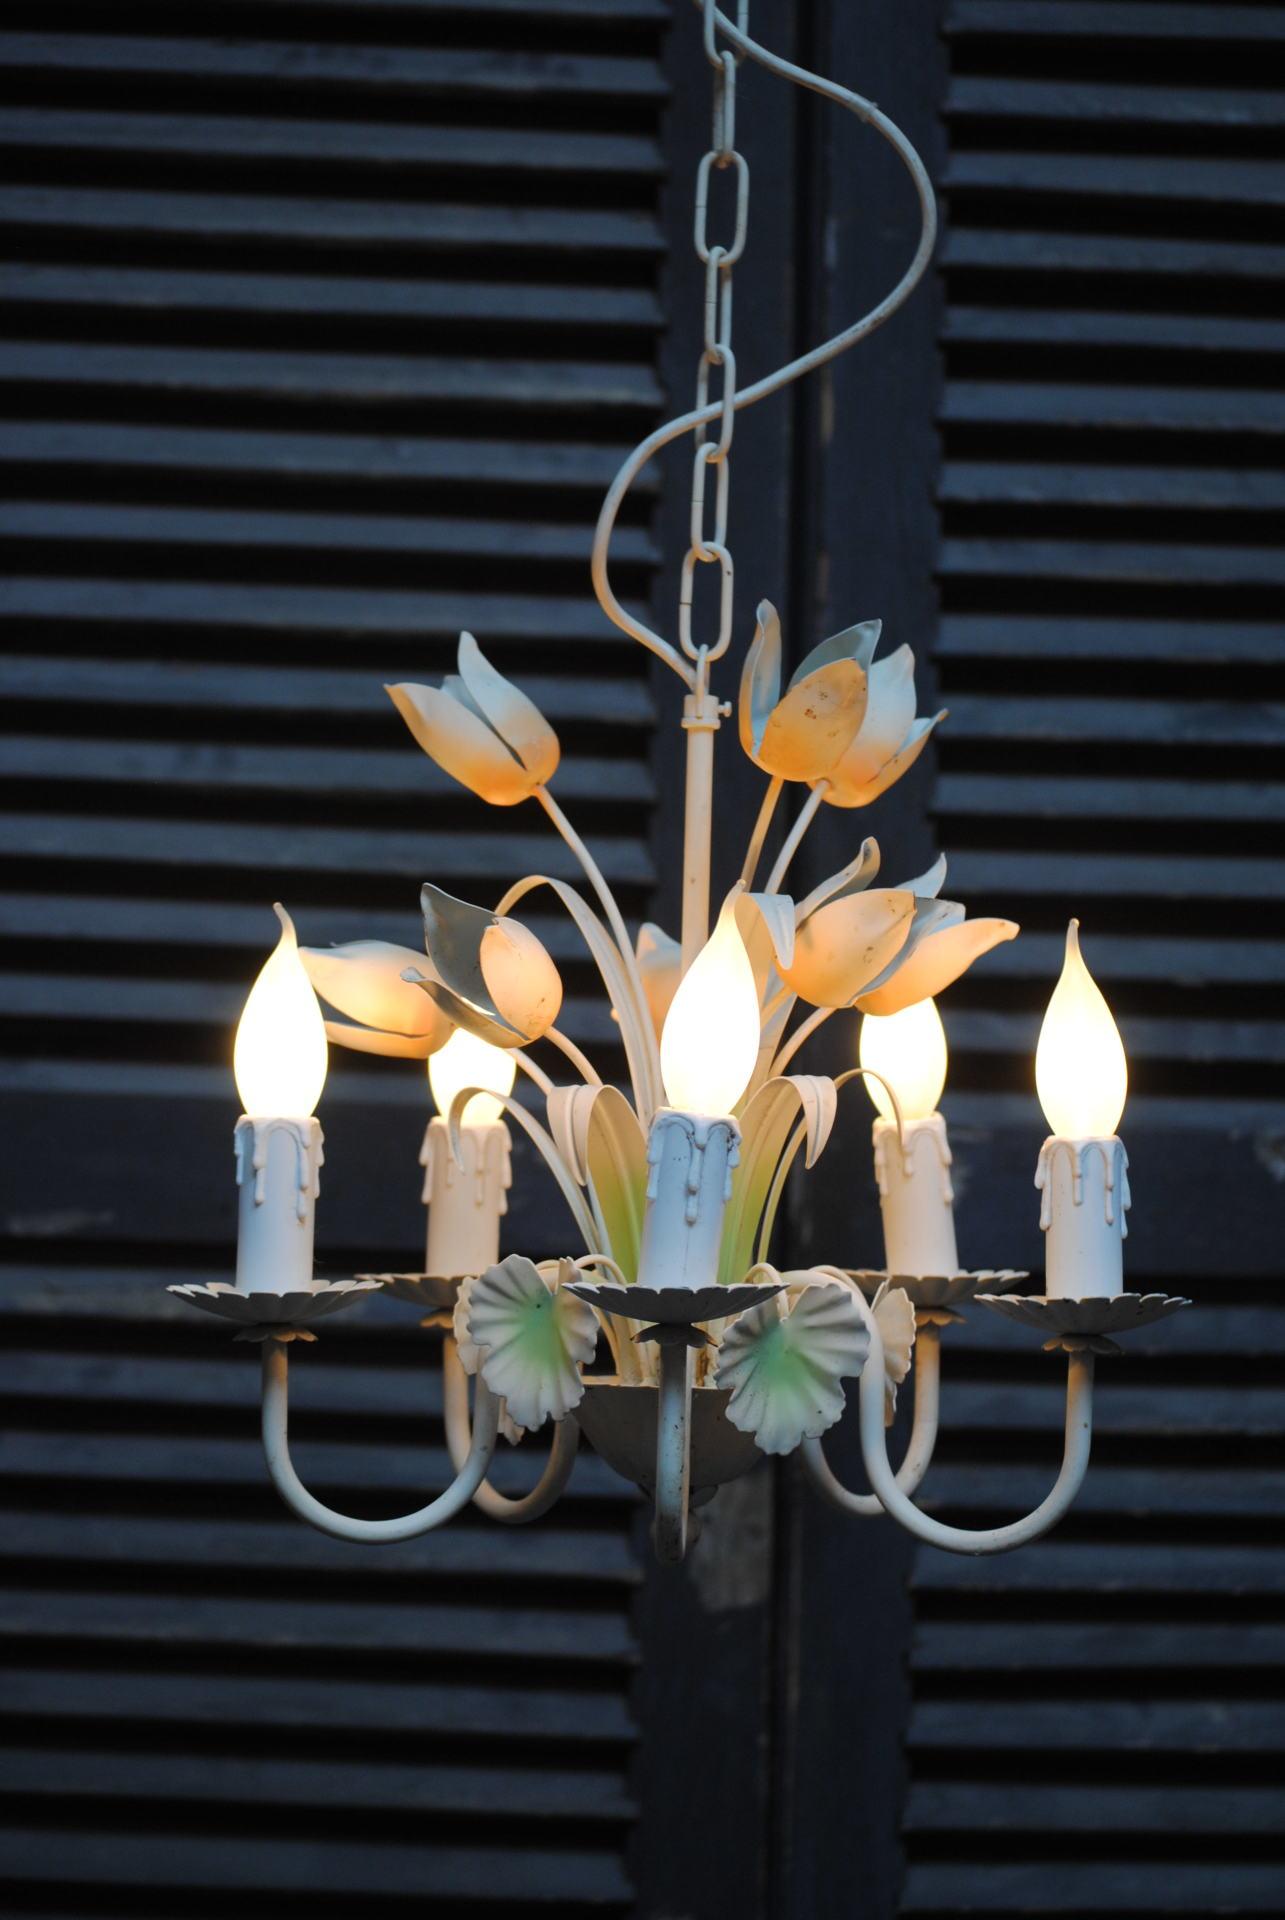 antieke kroonluchter art deco kristallen vintage kroonluchter la folie antiek den bosch 's-hertogenbosch nederland noord-brabant 15 lichts kroonluchter kristal frankrijk 1950